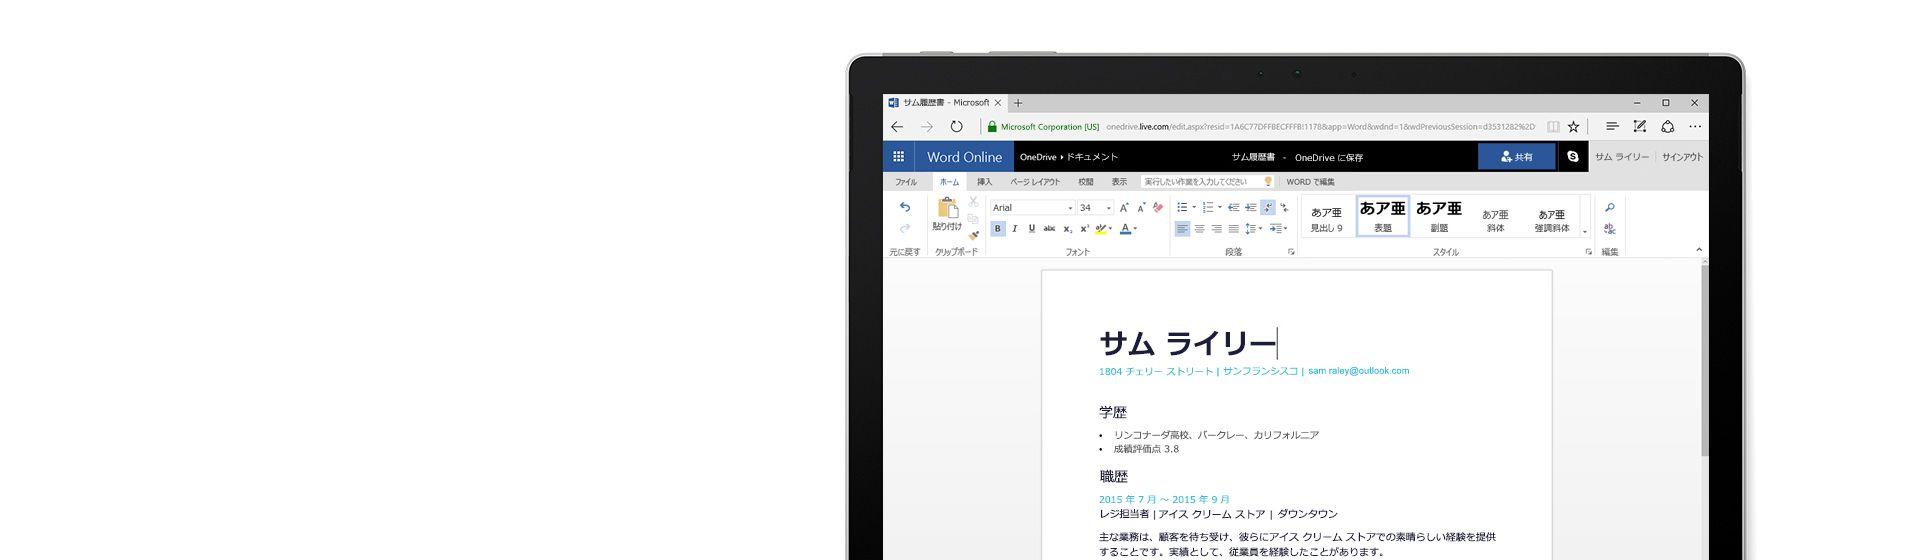 Word Online で作成中の履歴書が表示されているコンピューター画面